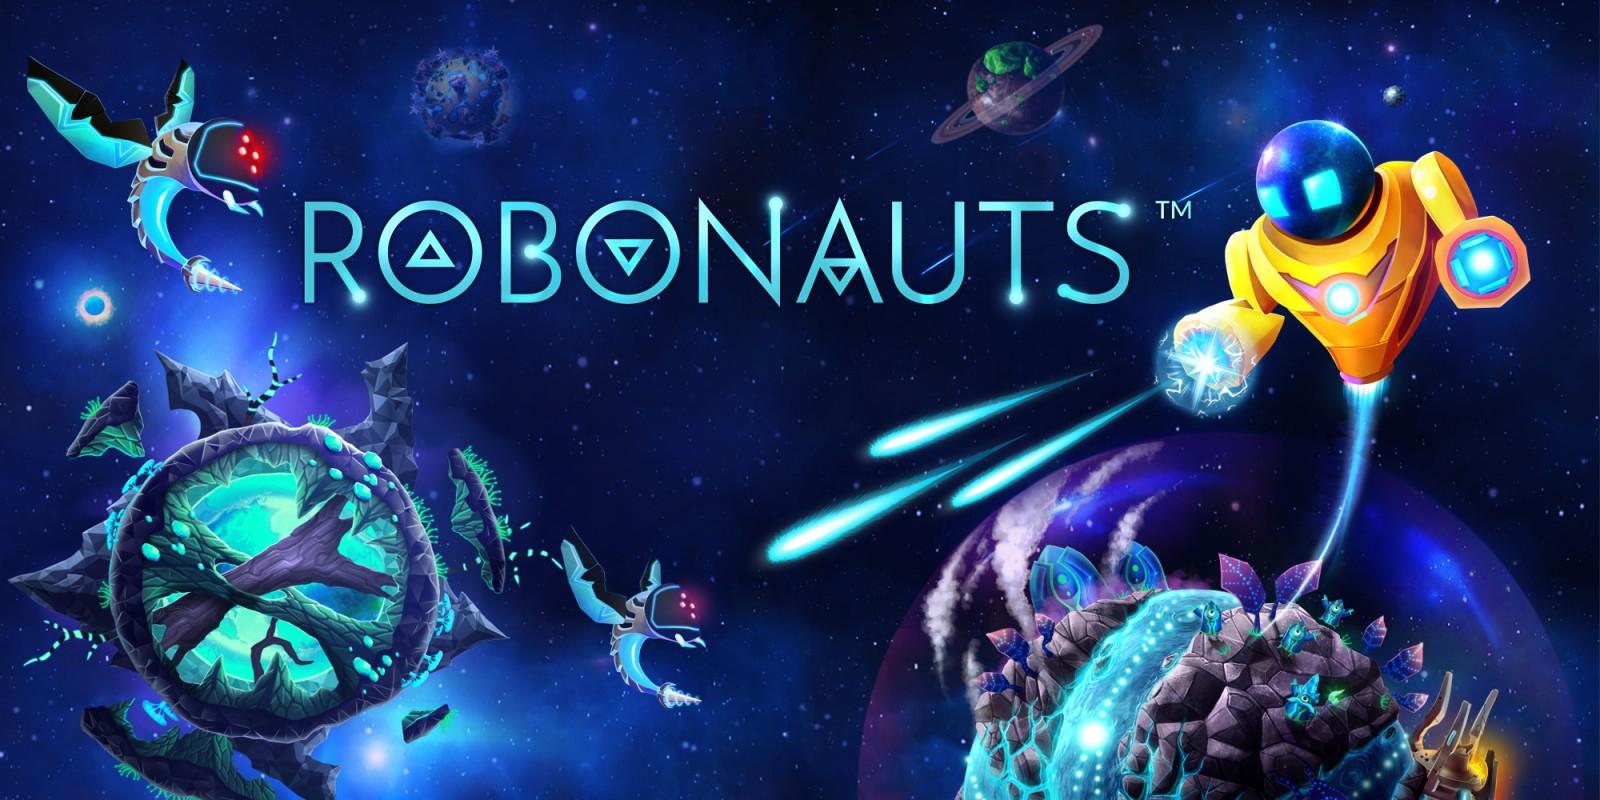 NINTENDO SWITCH: Robonauts (Nintendo Store)